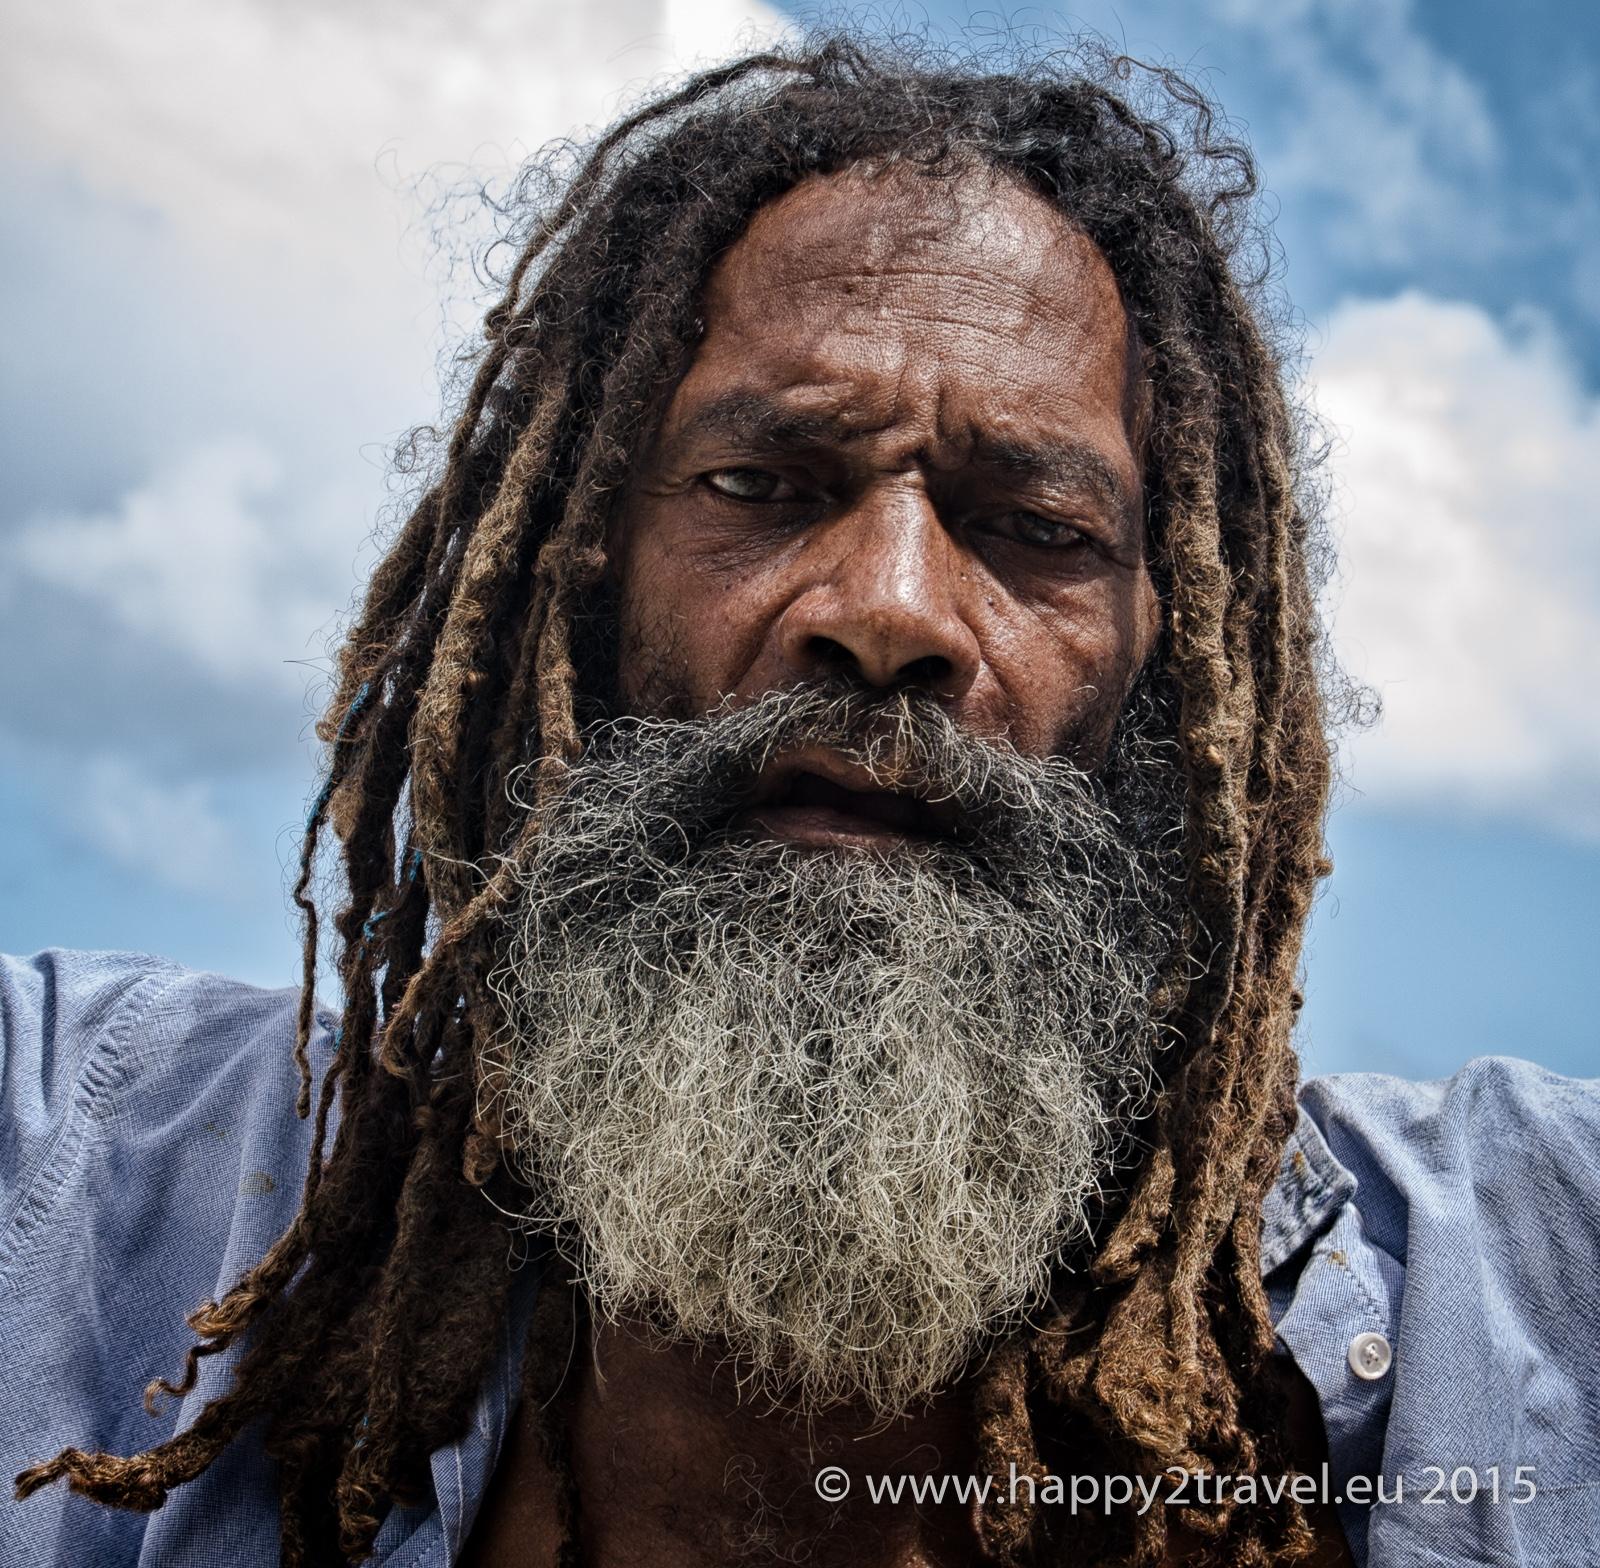 Tváre Belize: nahnevaný muž